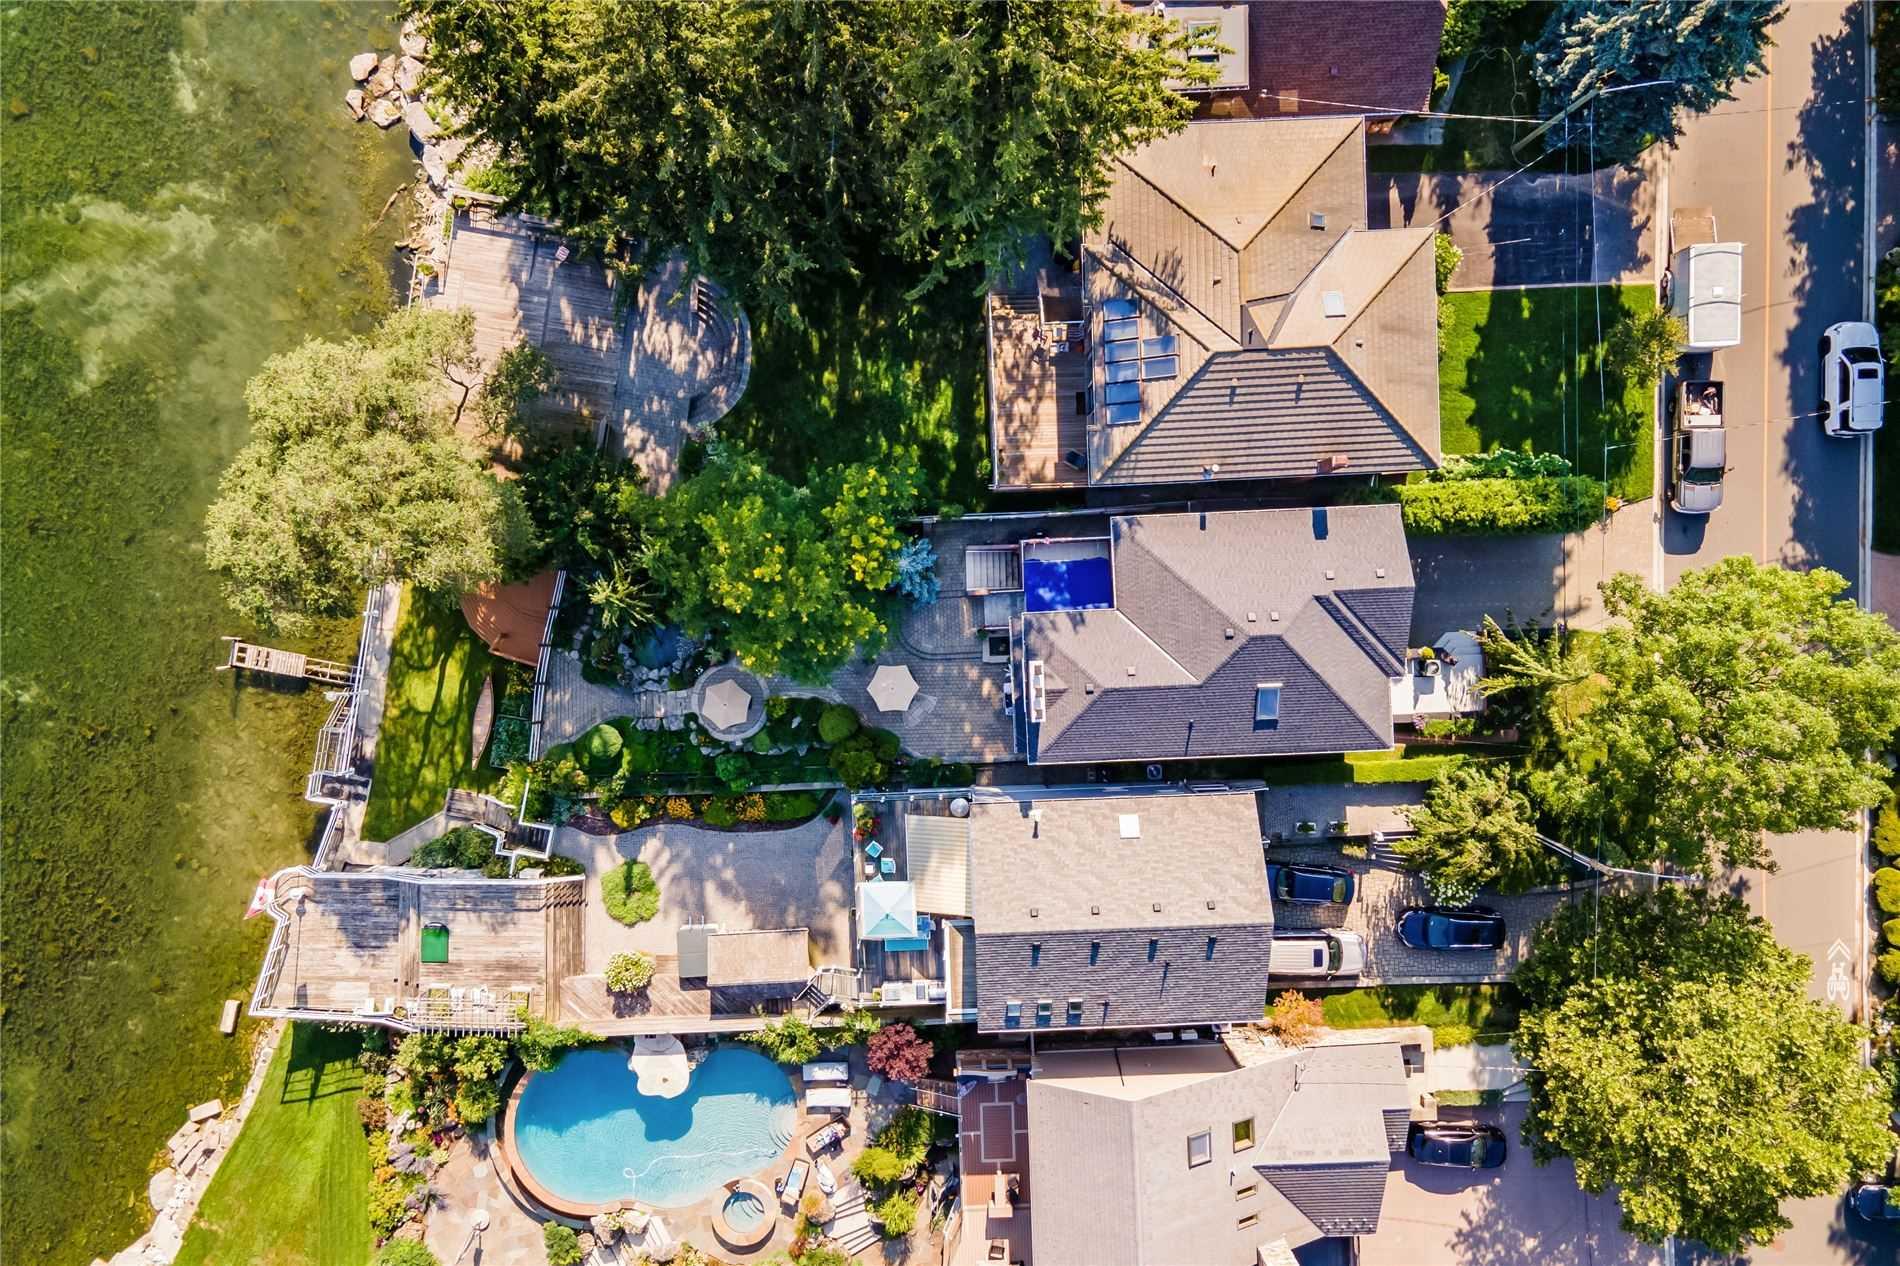 327A Lake Promenade, Toronto, Ontario M8W 1A6, 4 Bedrooms Bedrooms, 8 Rooms Rooms,4 BathroomsBathrooms,Detached,For Sale,Lake Promenade,W5356552